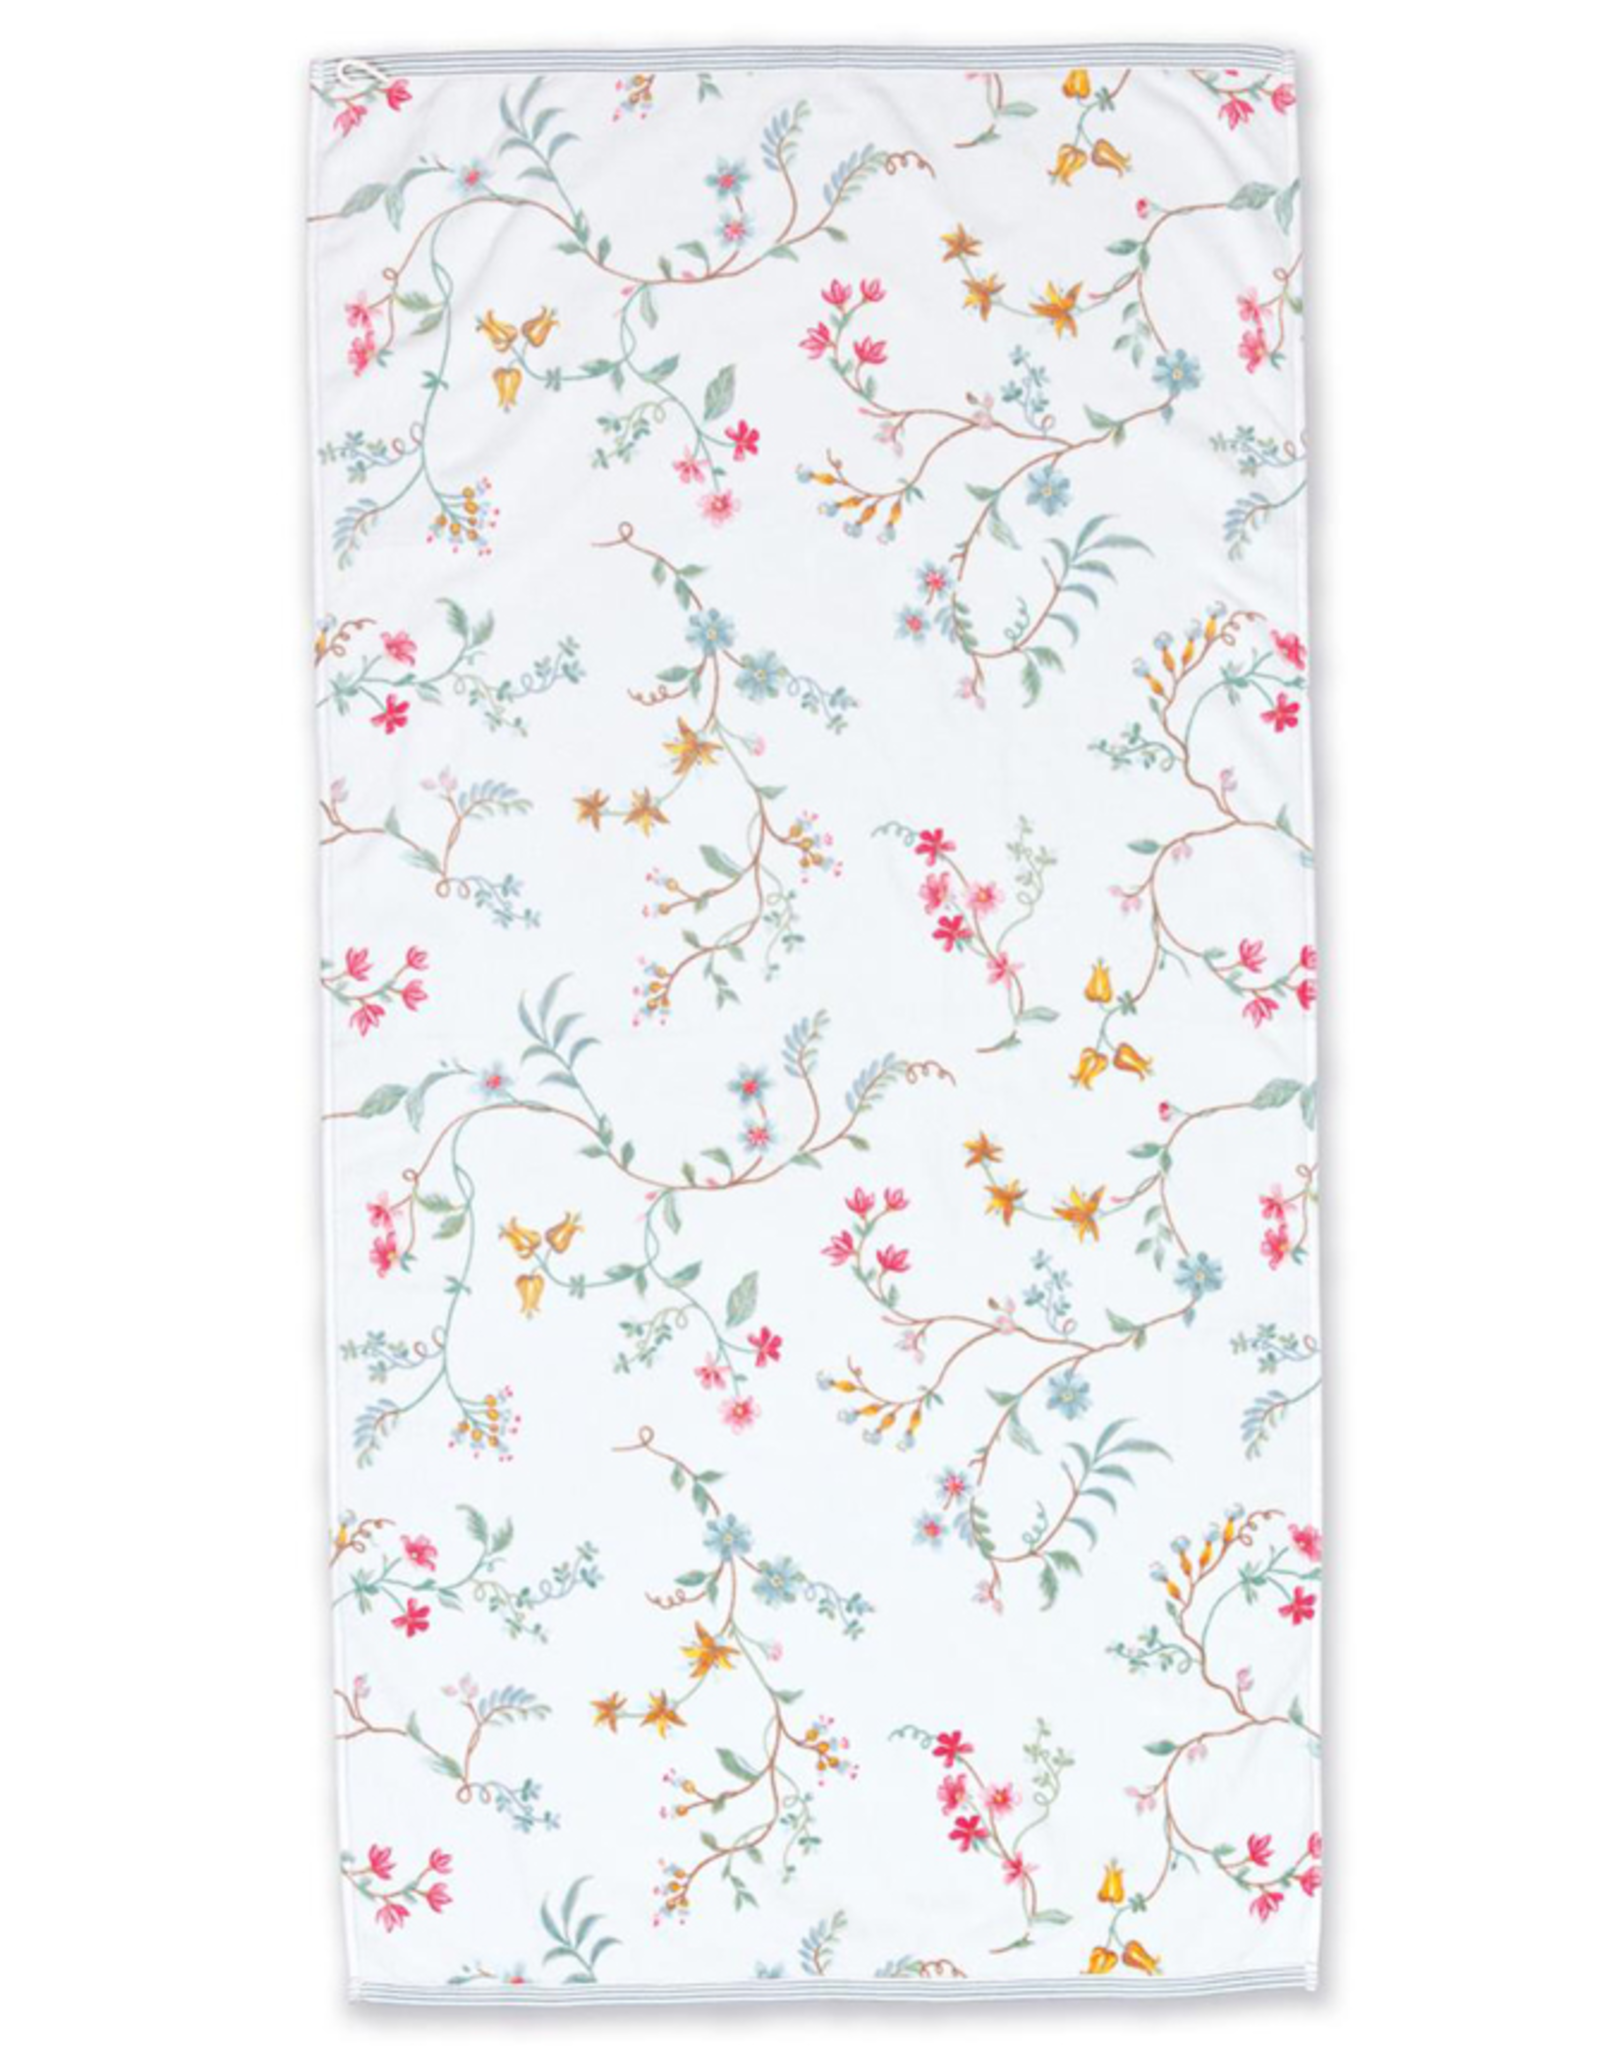 Pip Studio Handdoek groot Les Fleurs 70x140cm wit - Pip Studio